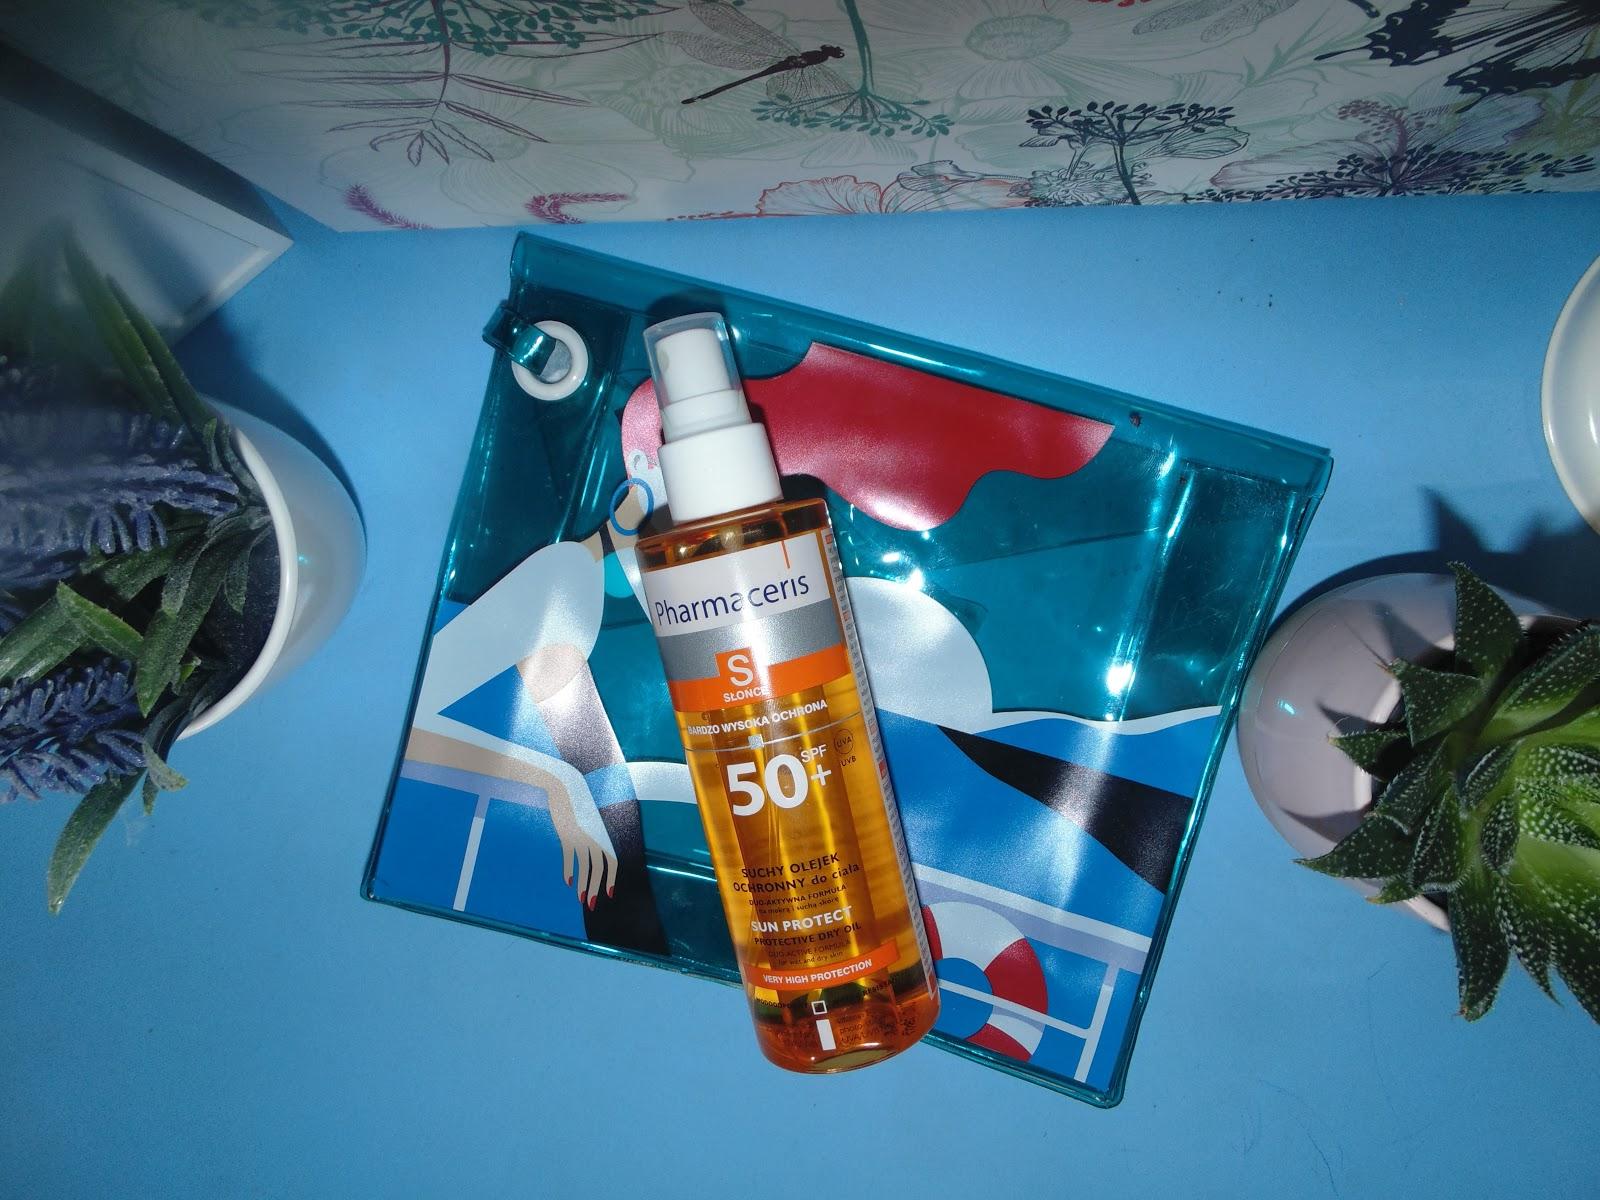 sephora kosmetyczka uchy olejek ochronny do ciała Pharmaceris z filtrem spf 50 + UVA I UVB z duo -aktywną formuła do suchej i mokrej skóry.